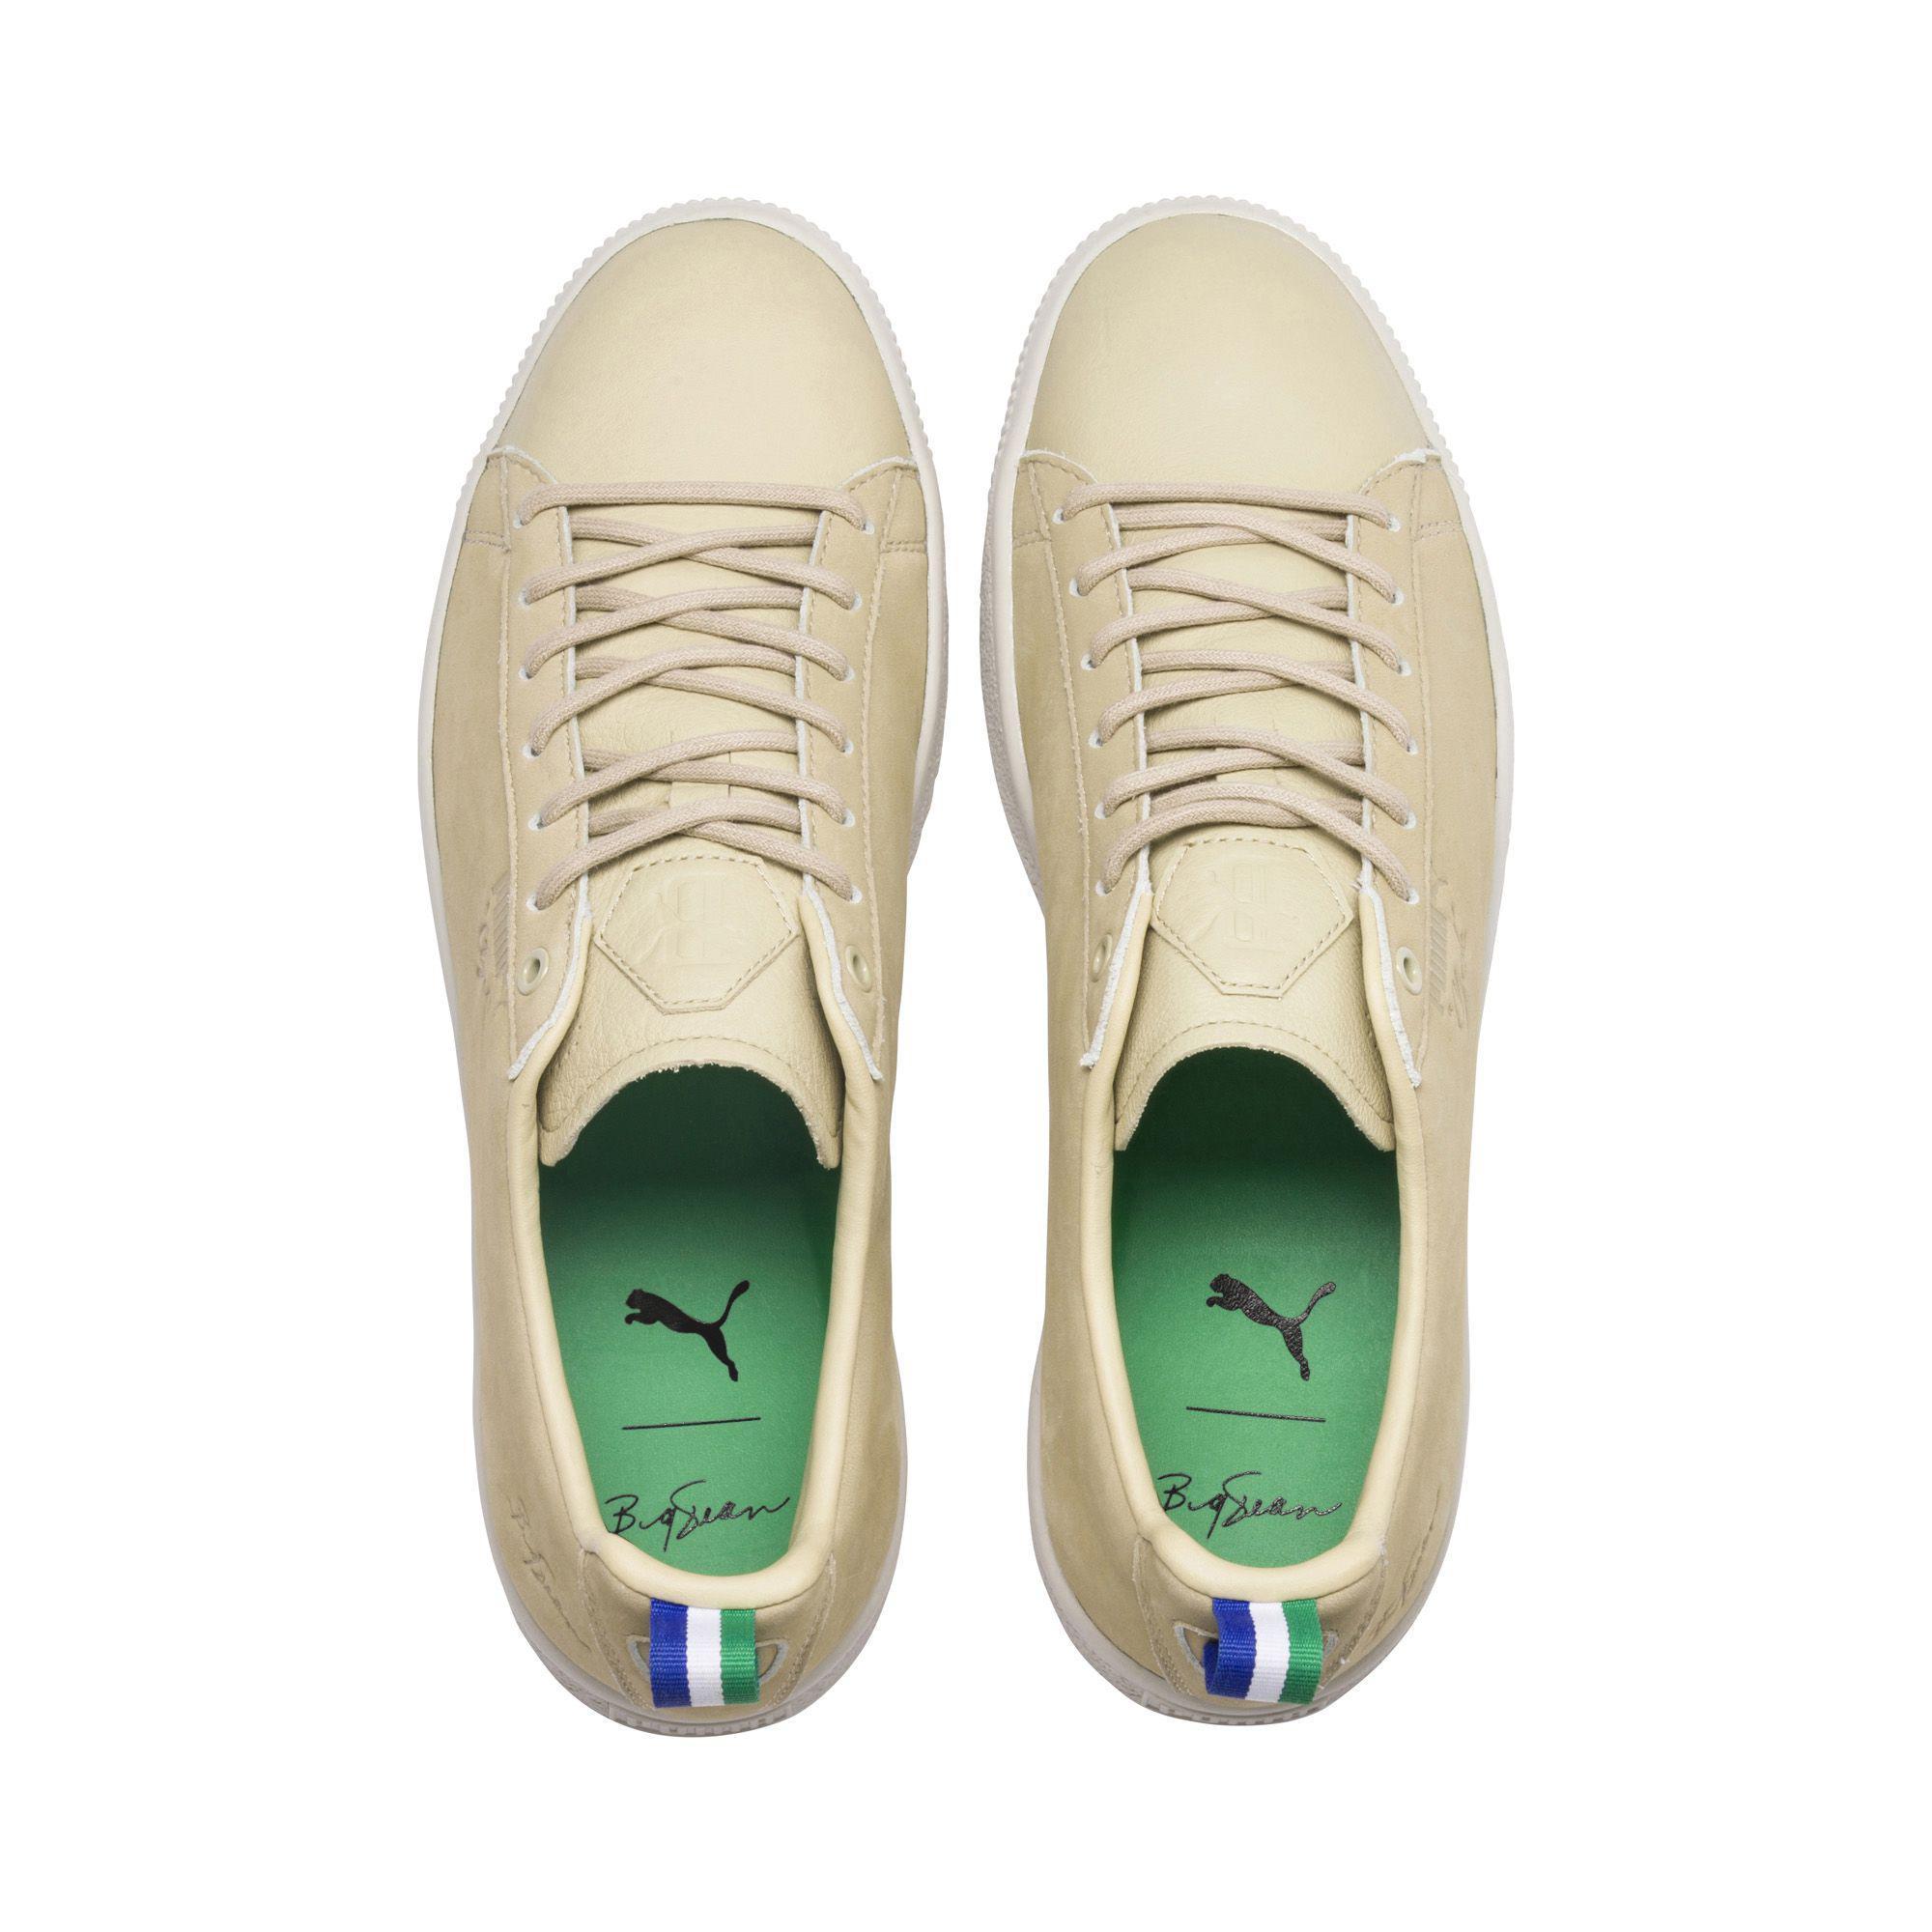 01f573f65fe Lyst - PUMA X Big Sean Clyde Pale Khaki Sneakers for Men